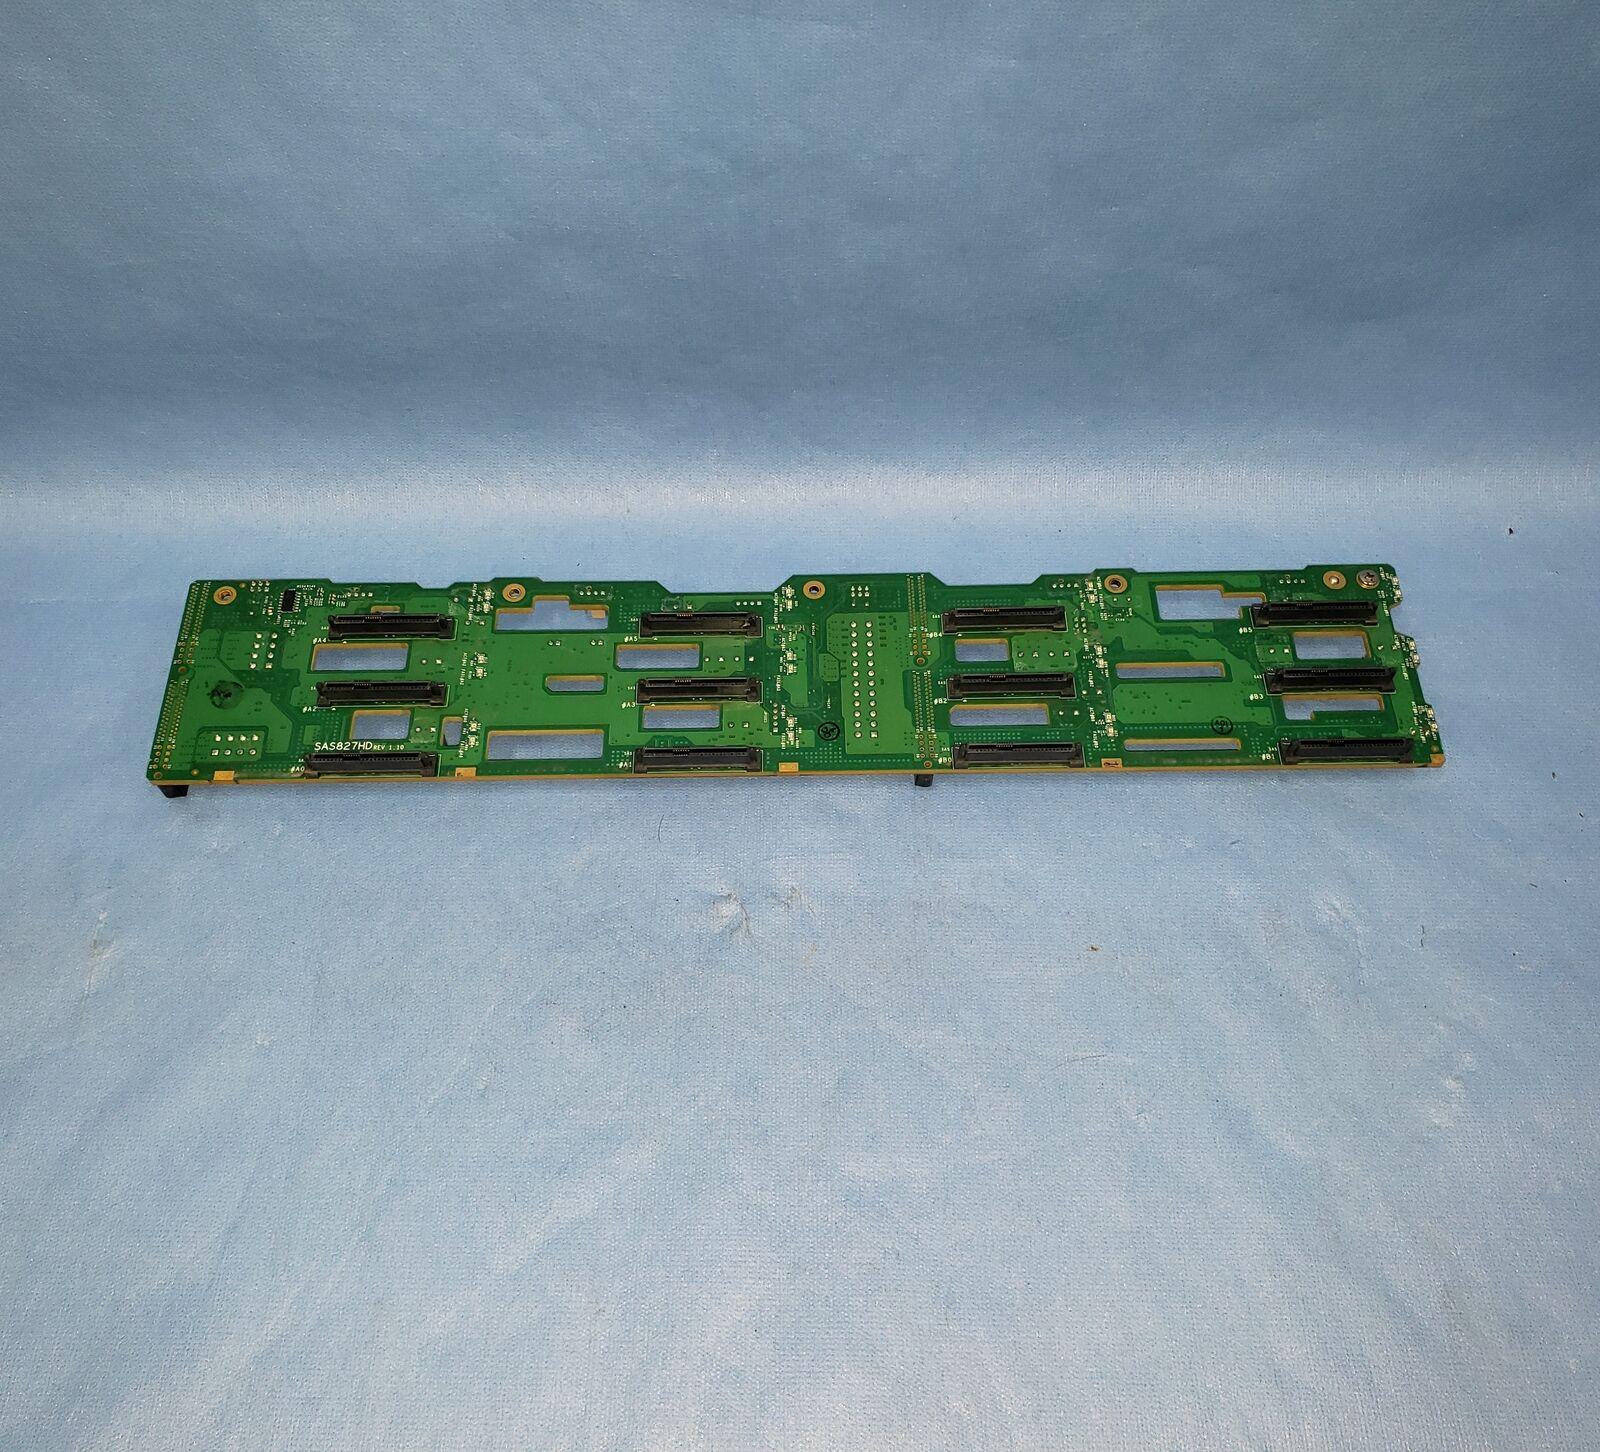 2x SuperMicro SAS827HD 12-Port 2U SAS